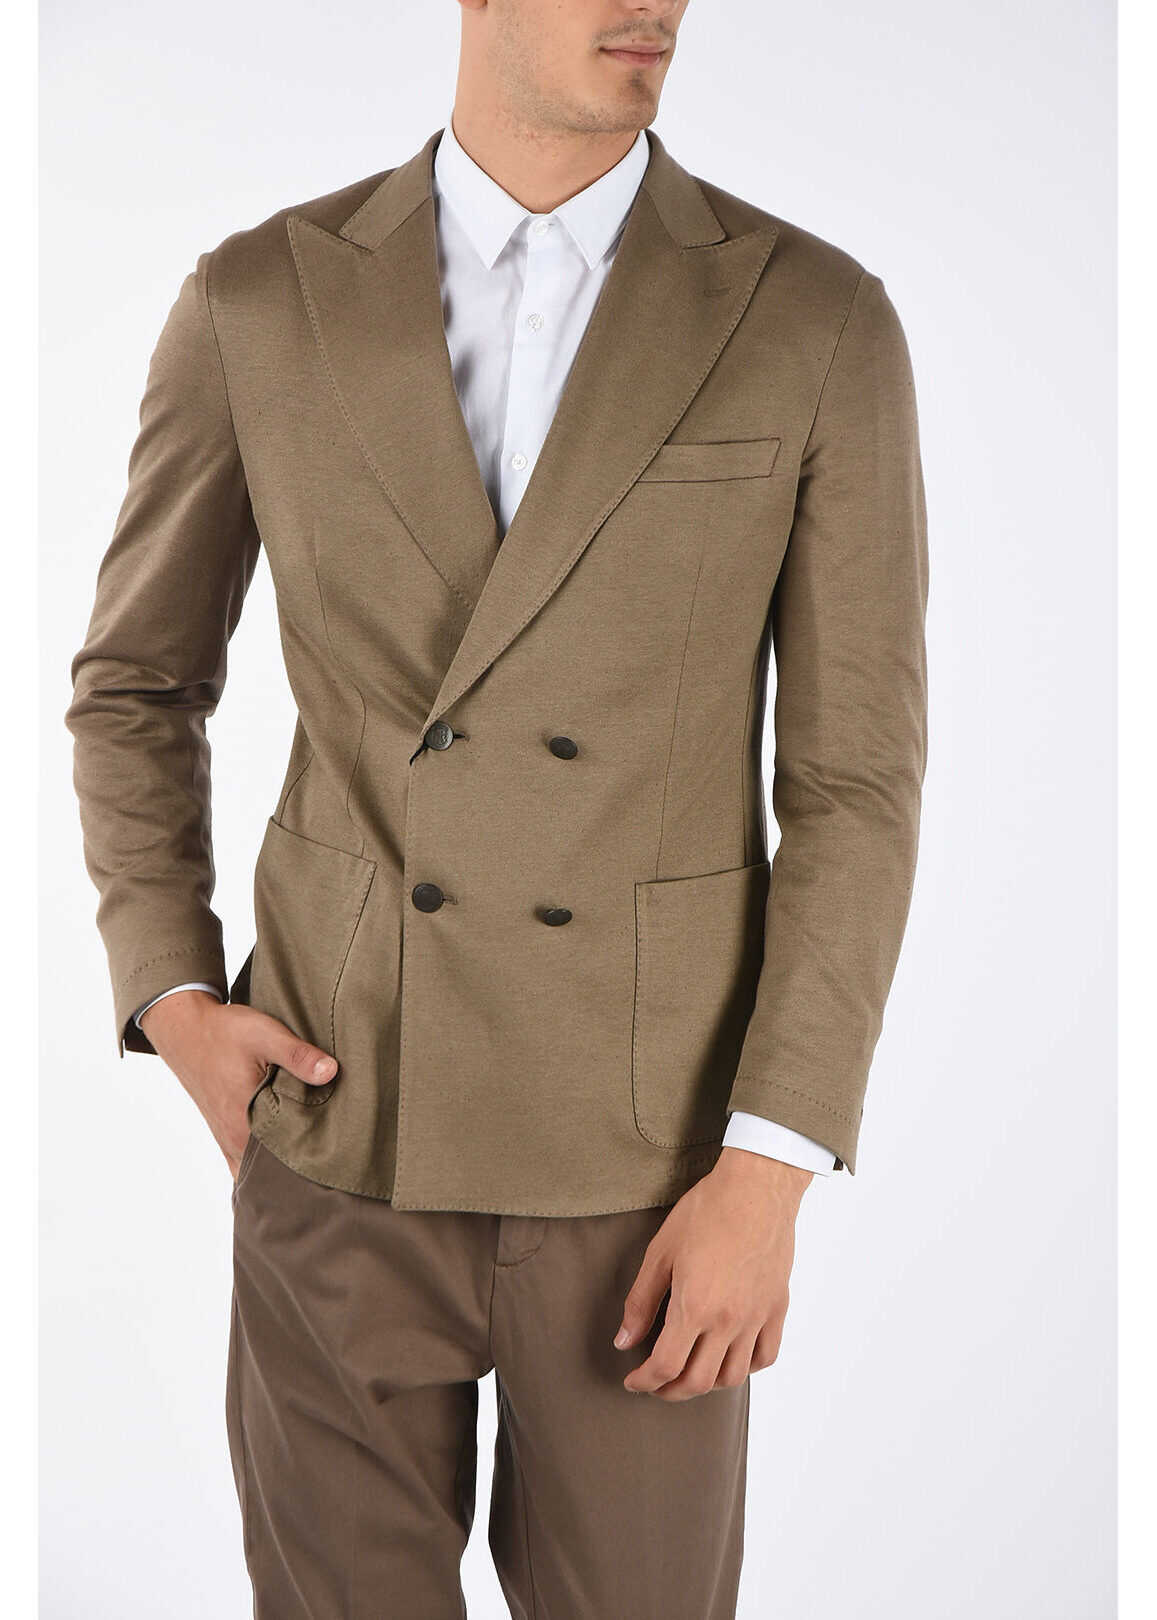 CORNELIANI ID peak lapel patch pocket double-breasted blazer BEIGE imagine